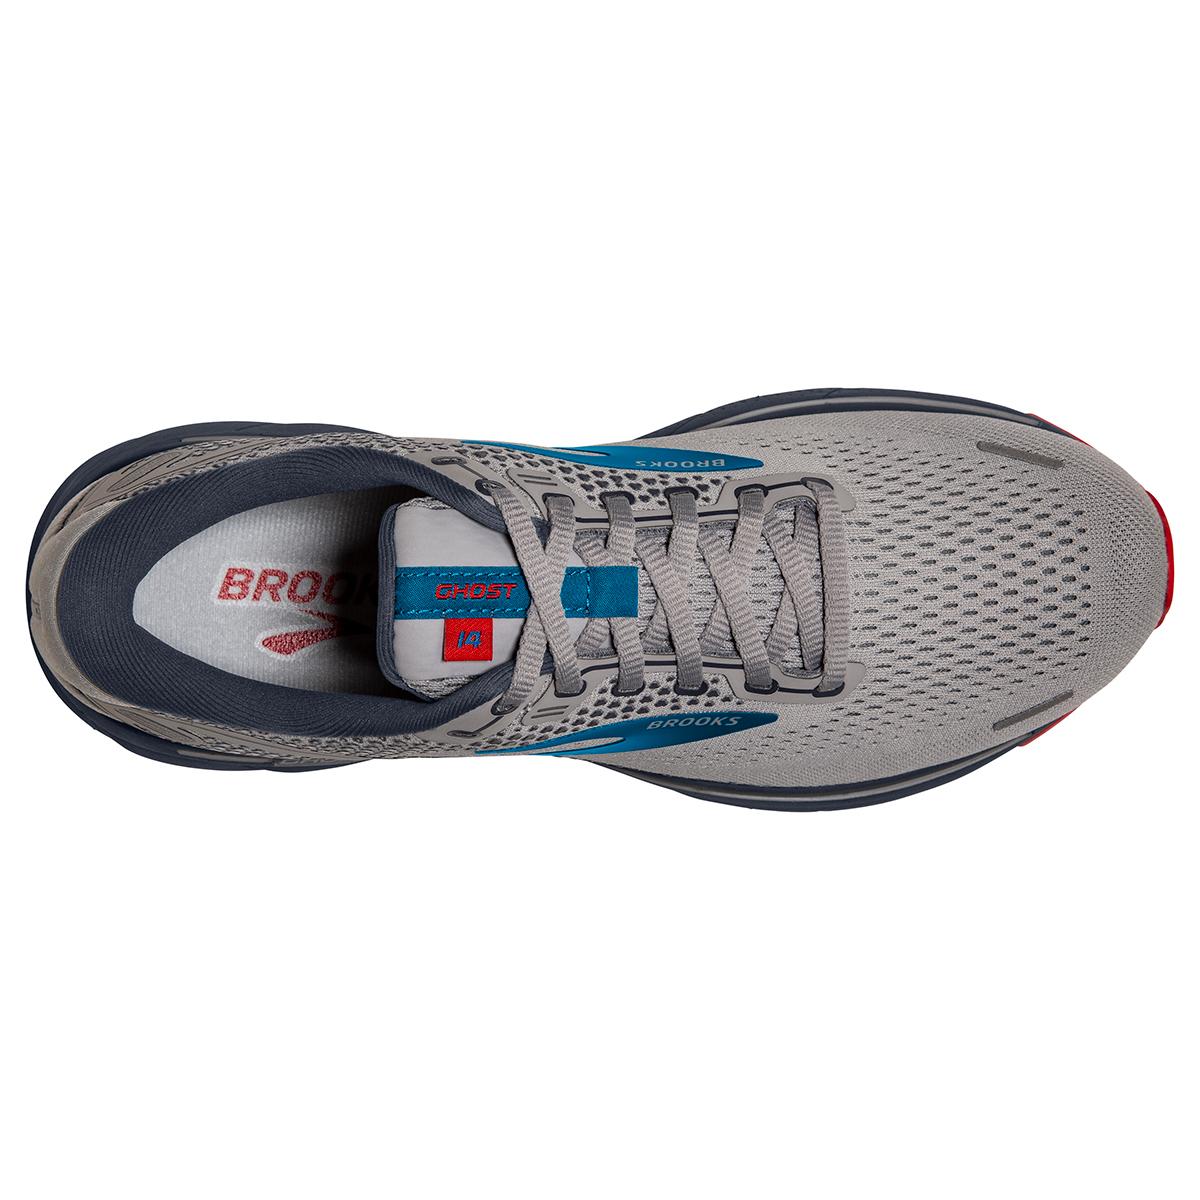 Men's Brooks Ghost 14 Running Shoe - Color: Grey/Blue/Red - Size: 7 - Width: Regular, Grey/Blue/Red, large, image 3